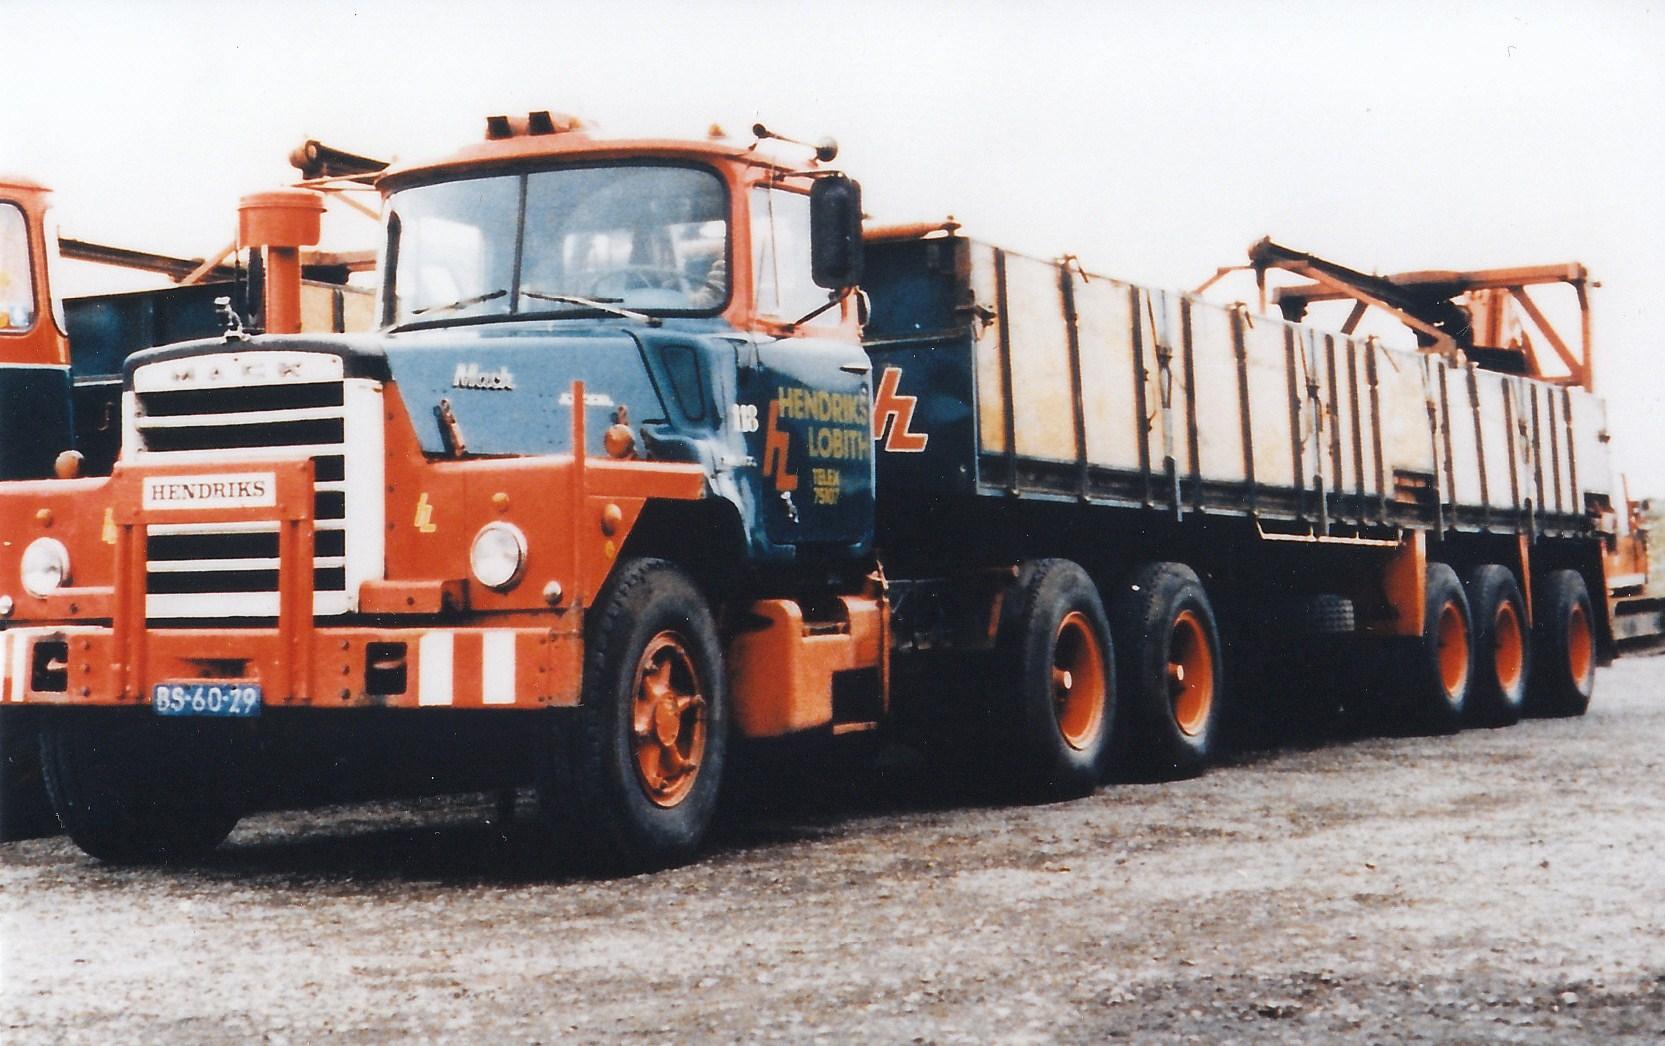 Hendriks-Lobith-Mack-DM609-S-BS6029-2